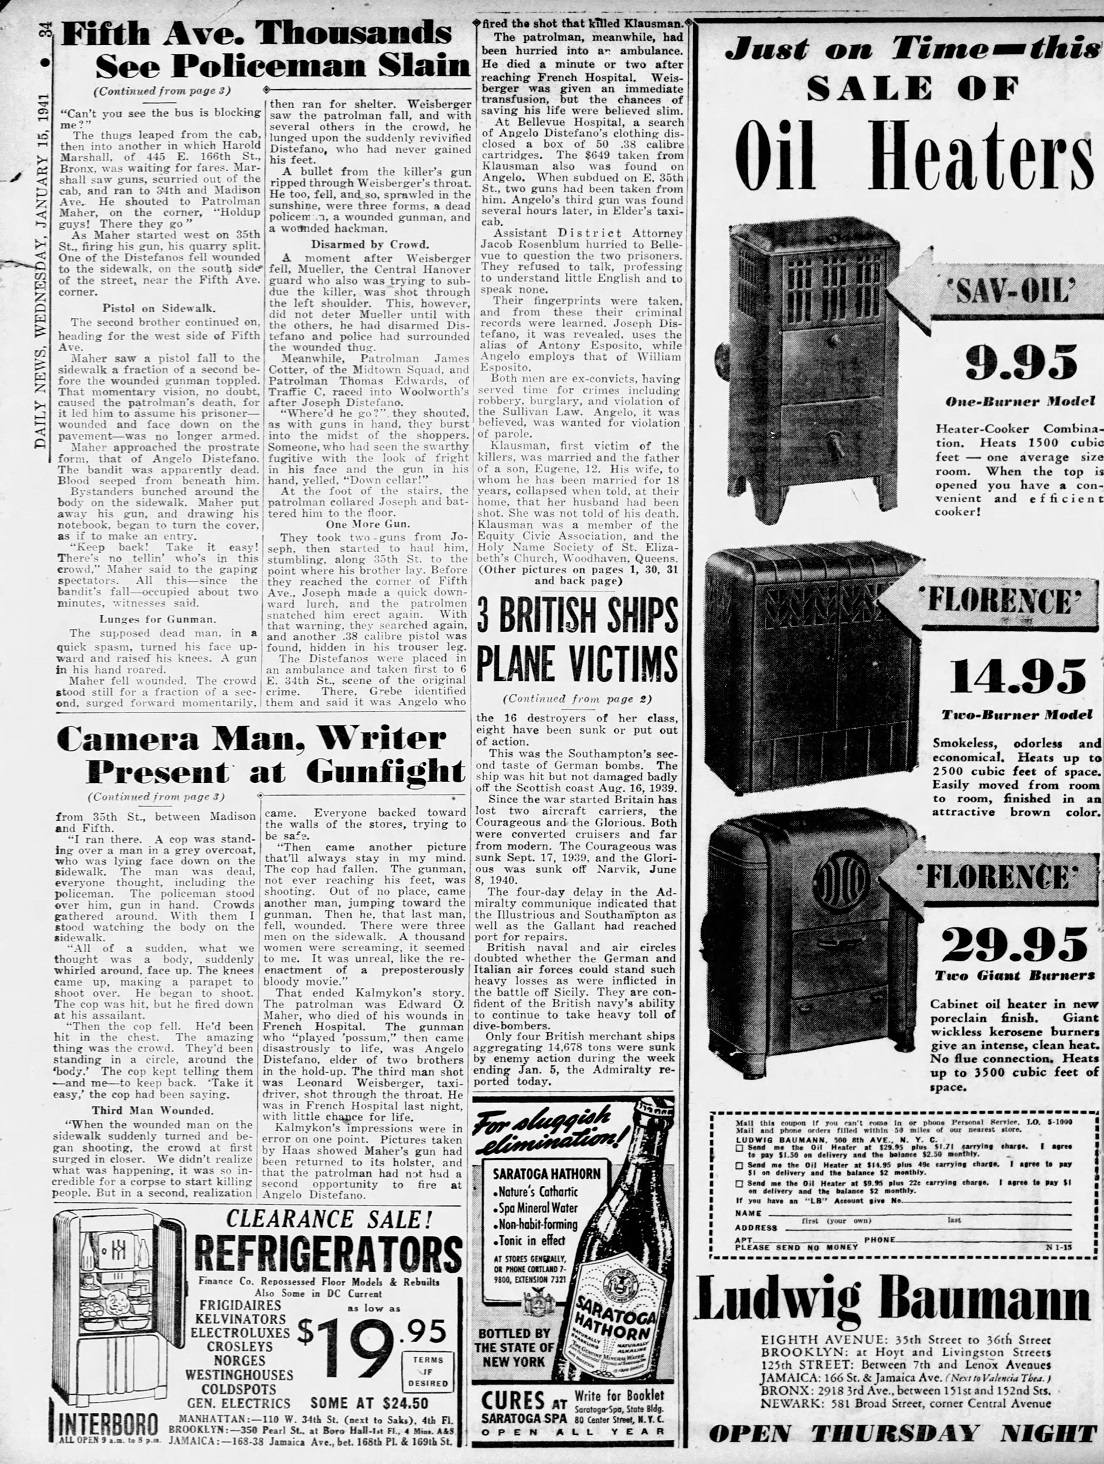 Daily_News_Wed__Jan_15__1941_(1).jpg